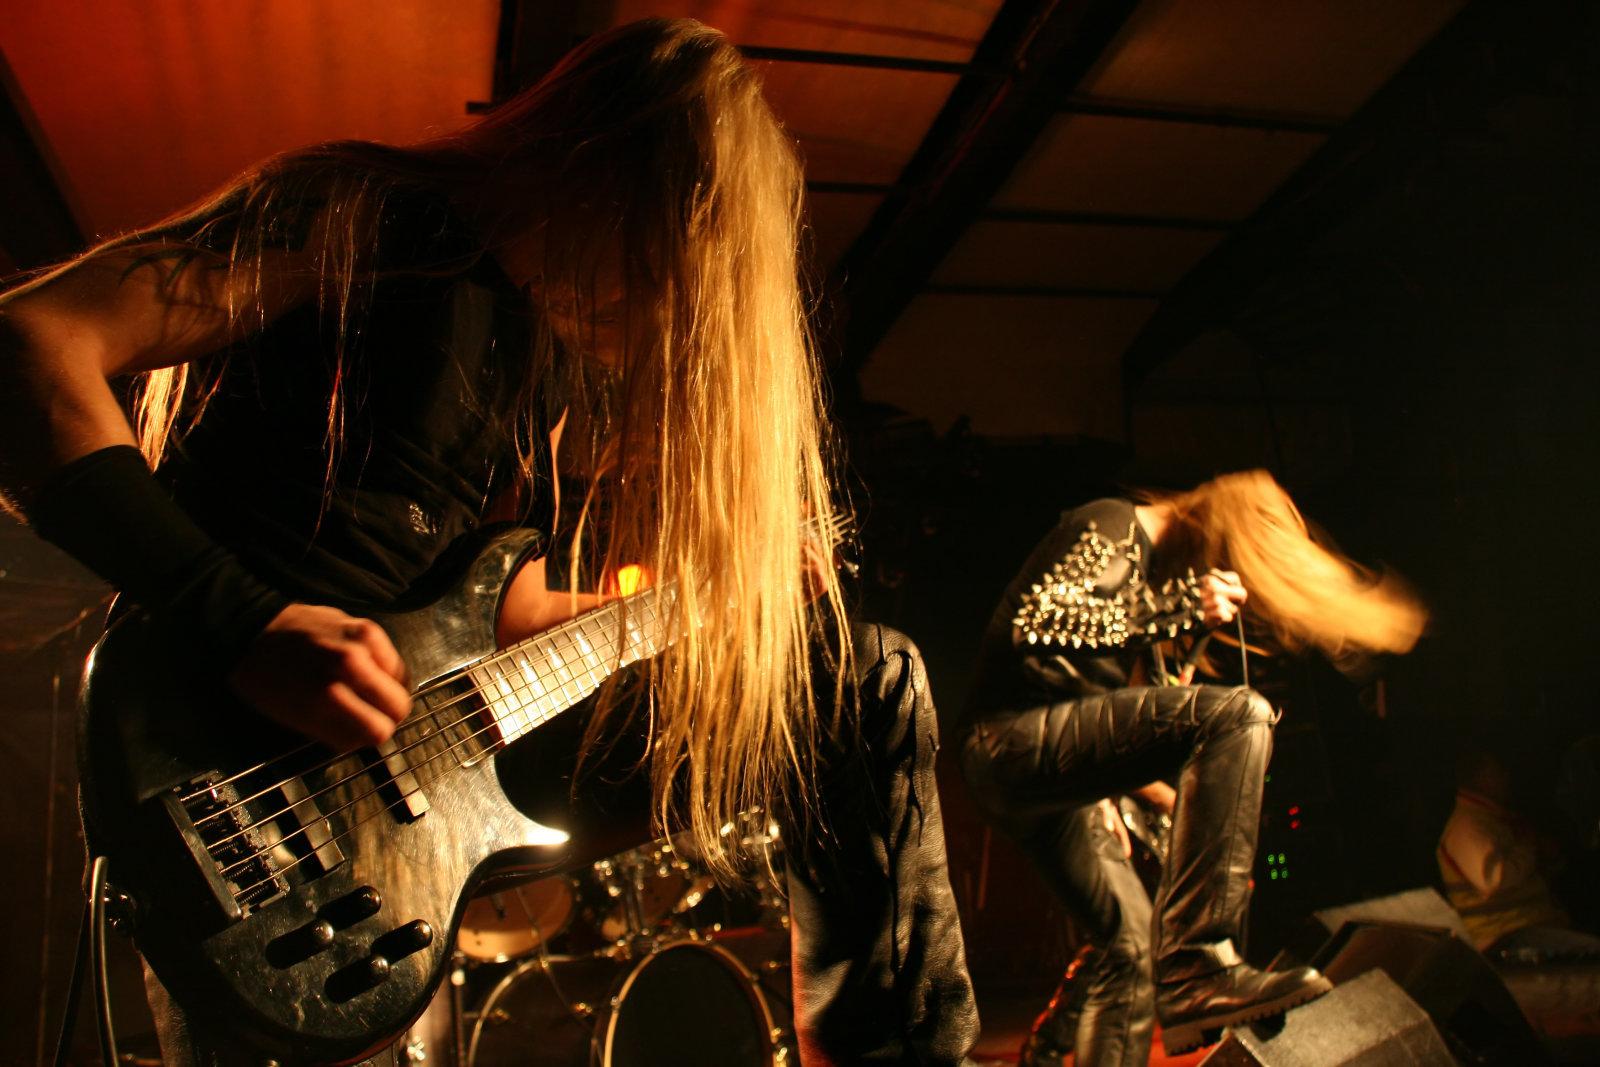 Black metal band on stage.td_uid_42_5cbc6e402bb99_rand.td-a-rec-img{text-align:left}.td_uid_42_5cbc6e402bb99_rand.td-a-rec-img img{margin:0 auto 0 0}Човекът има